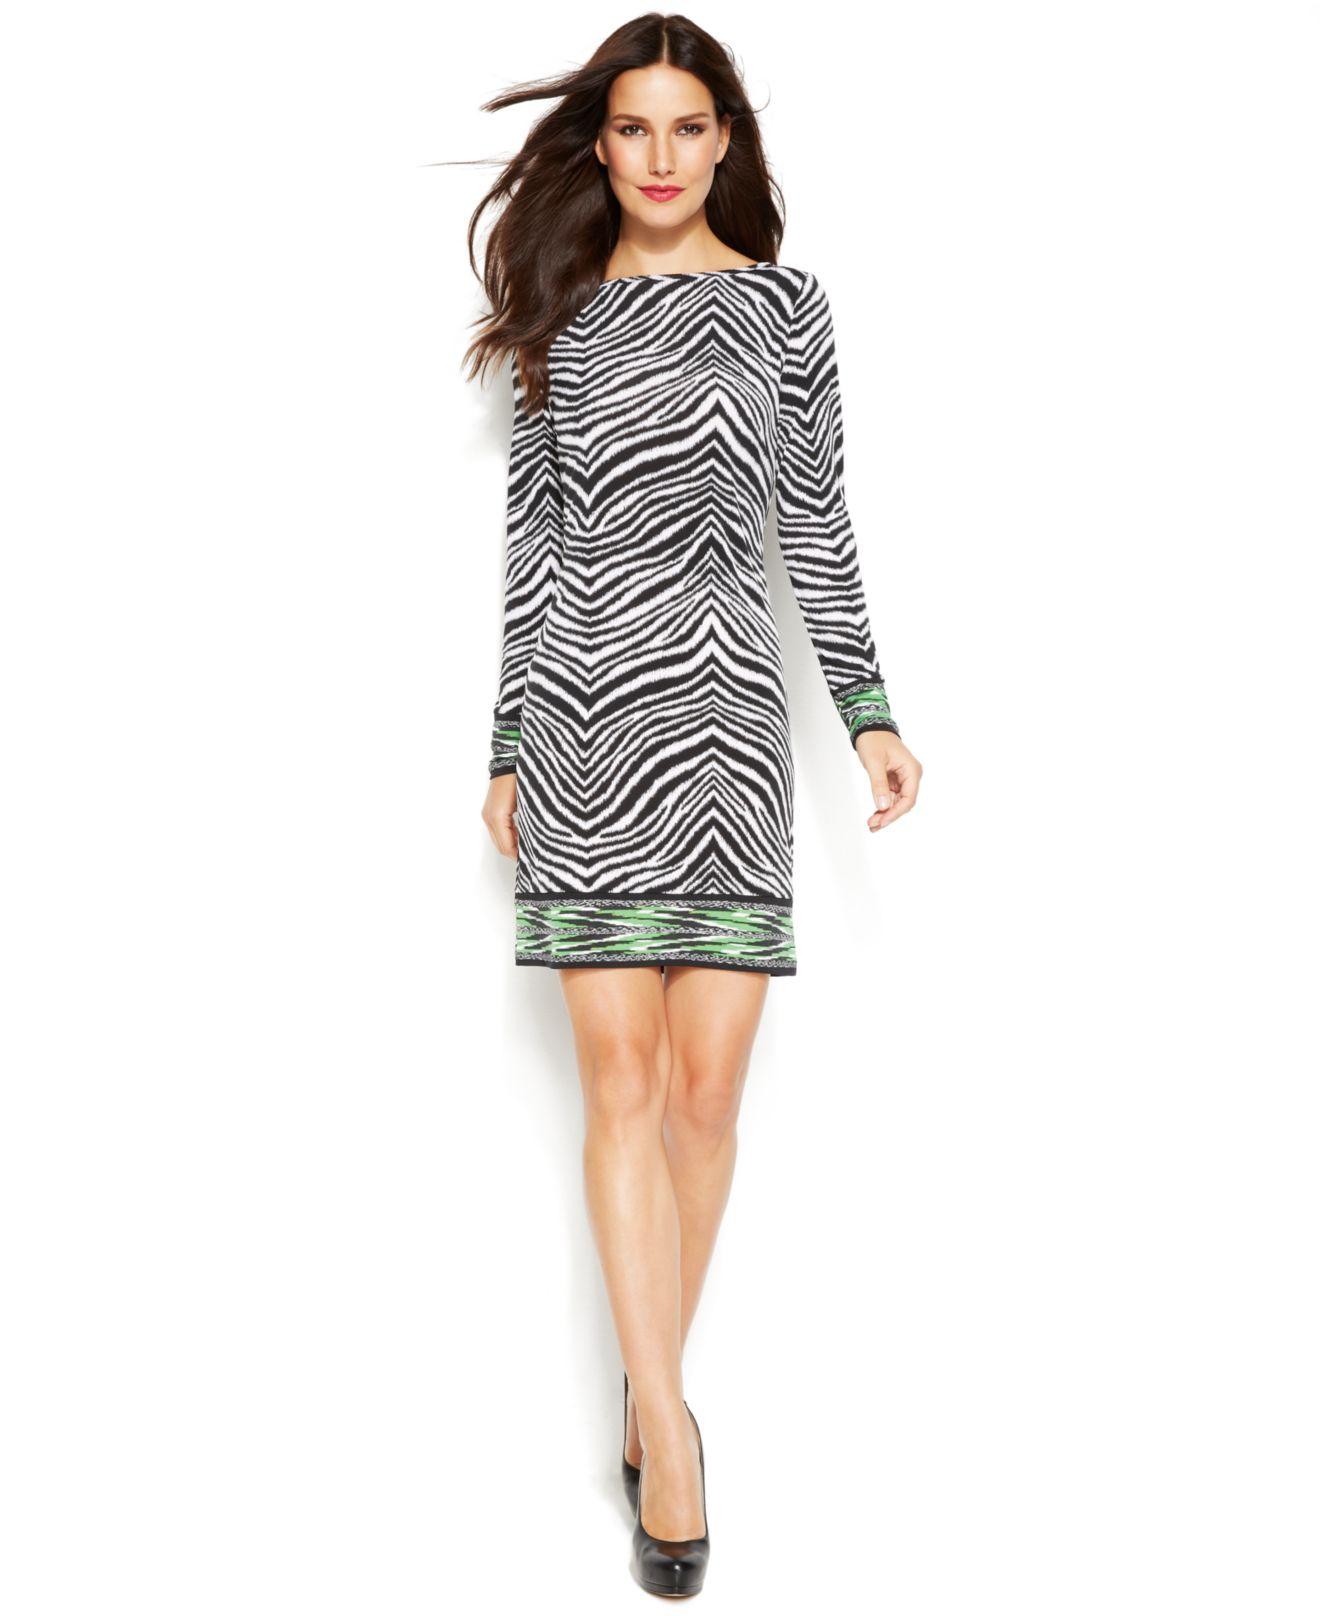 dec07912029b Michael Kors Michael Petite Long-Sleeve Animal-Print Shift Dress - Lyst